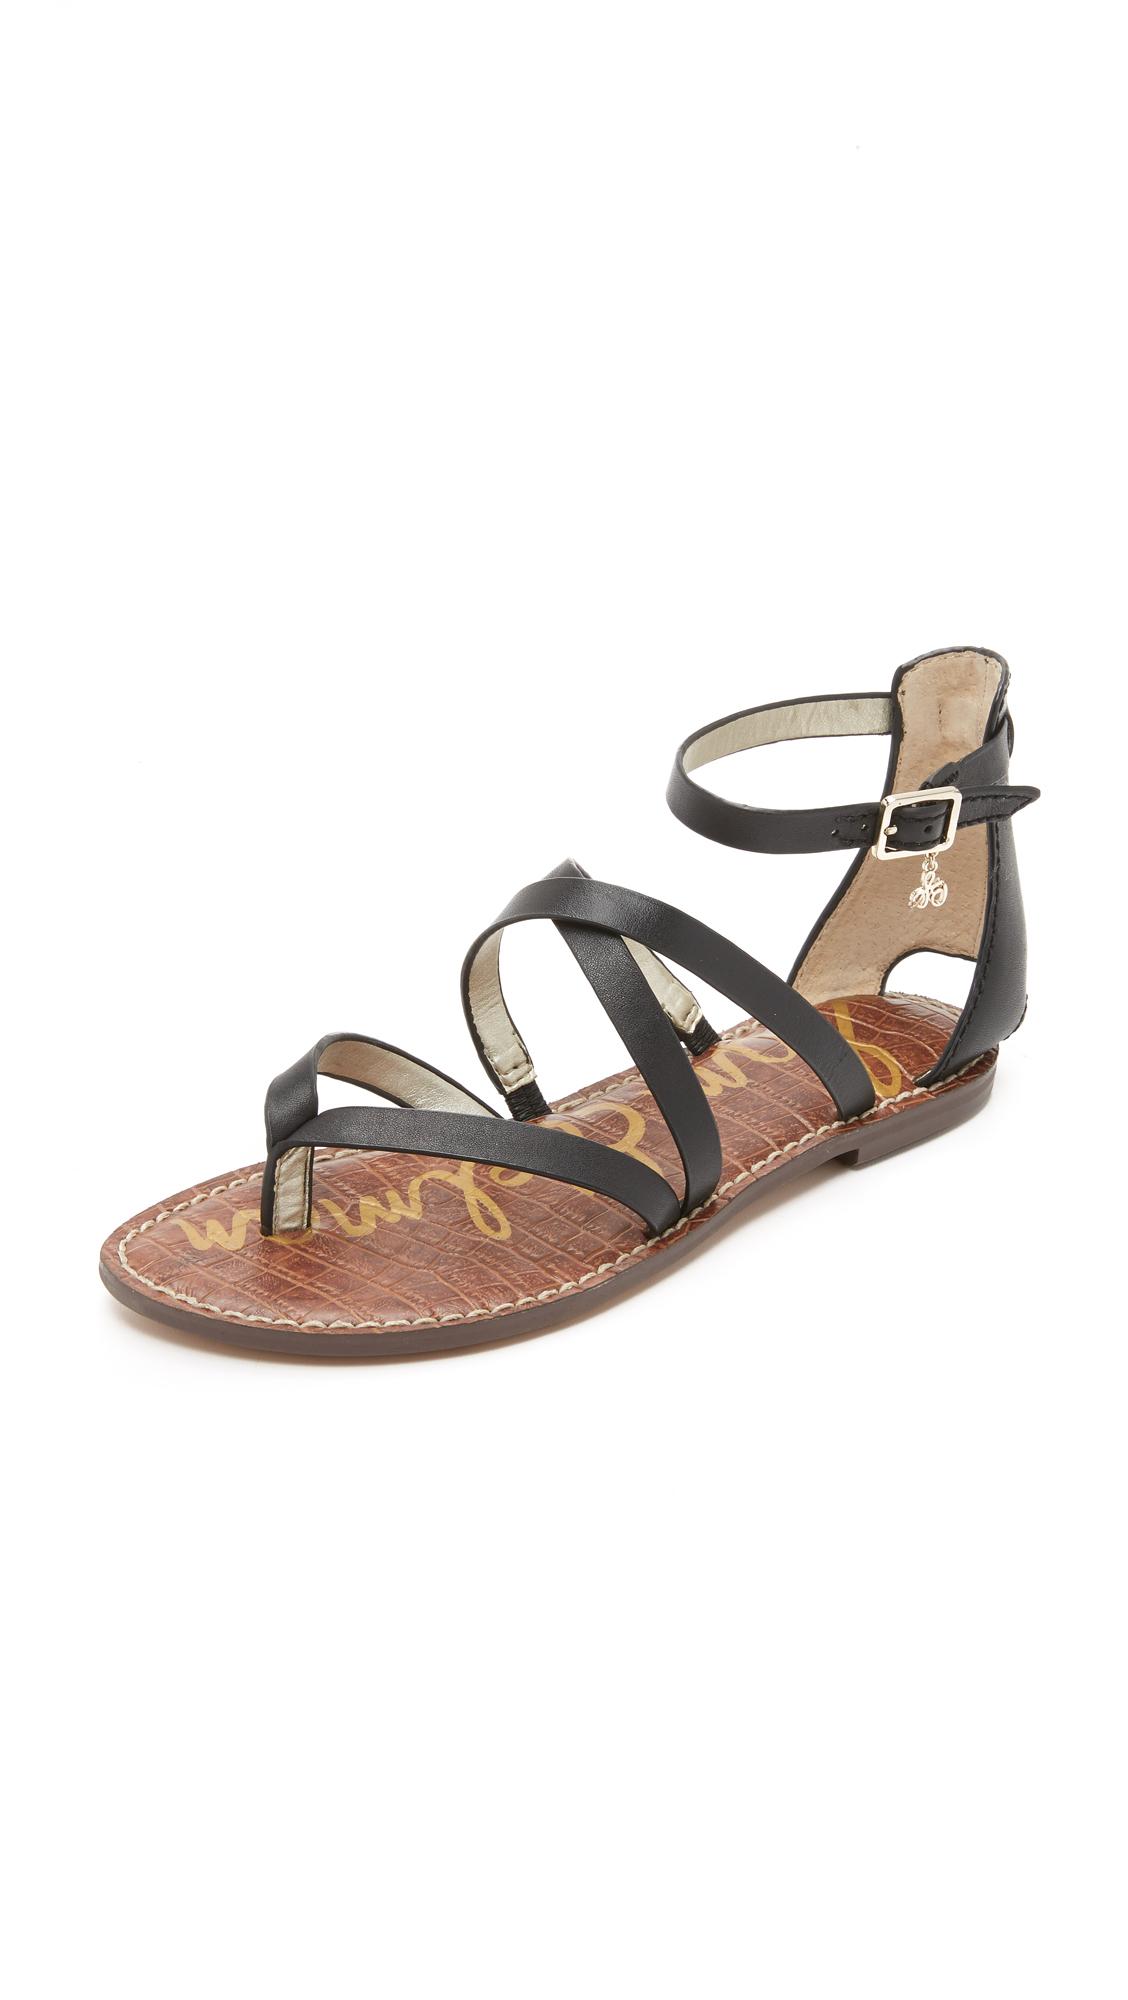 Sam Edelman Gilroy Flat Sandals In Black Lyst